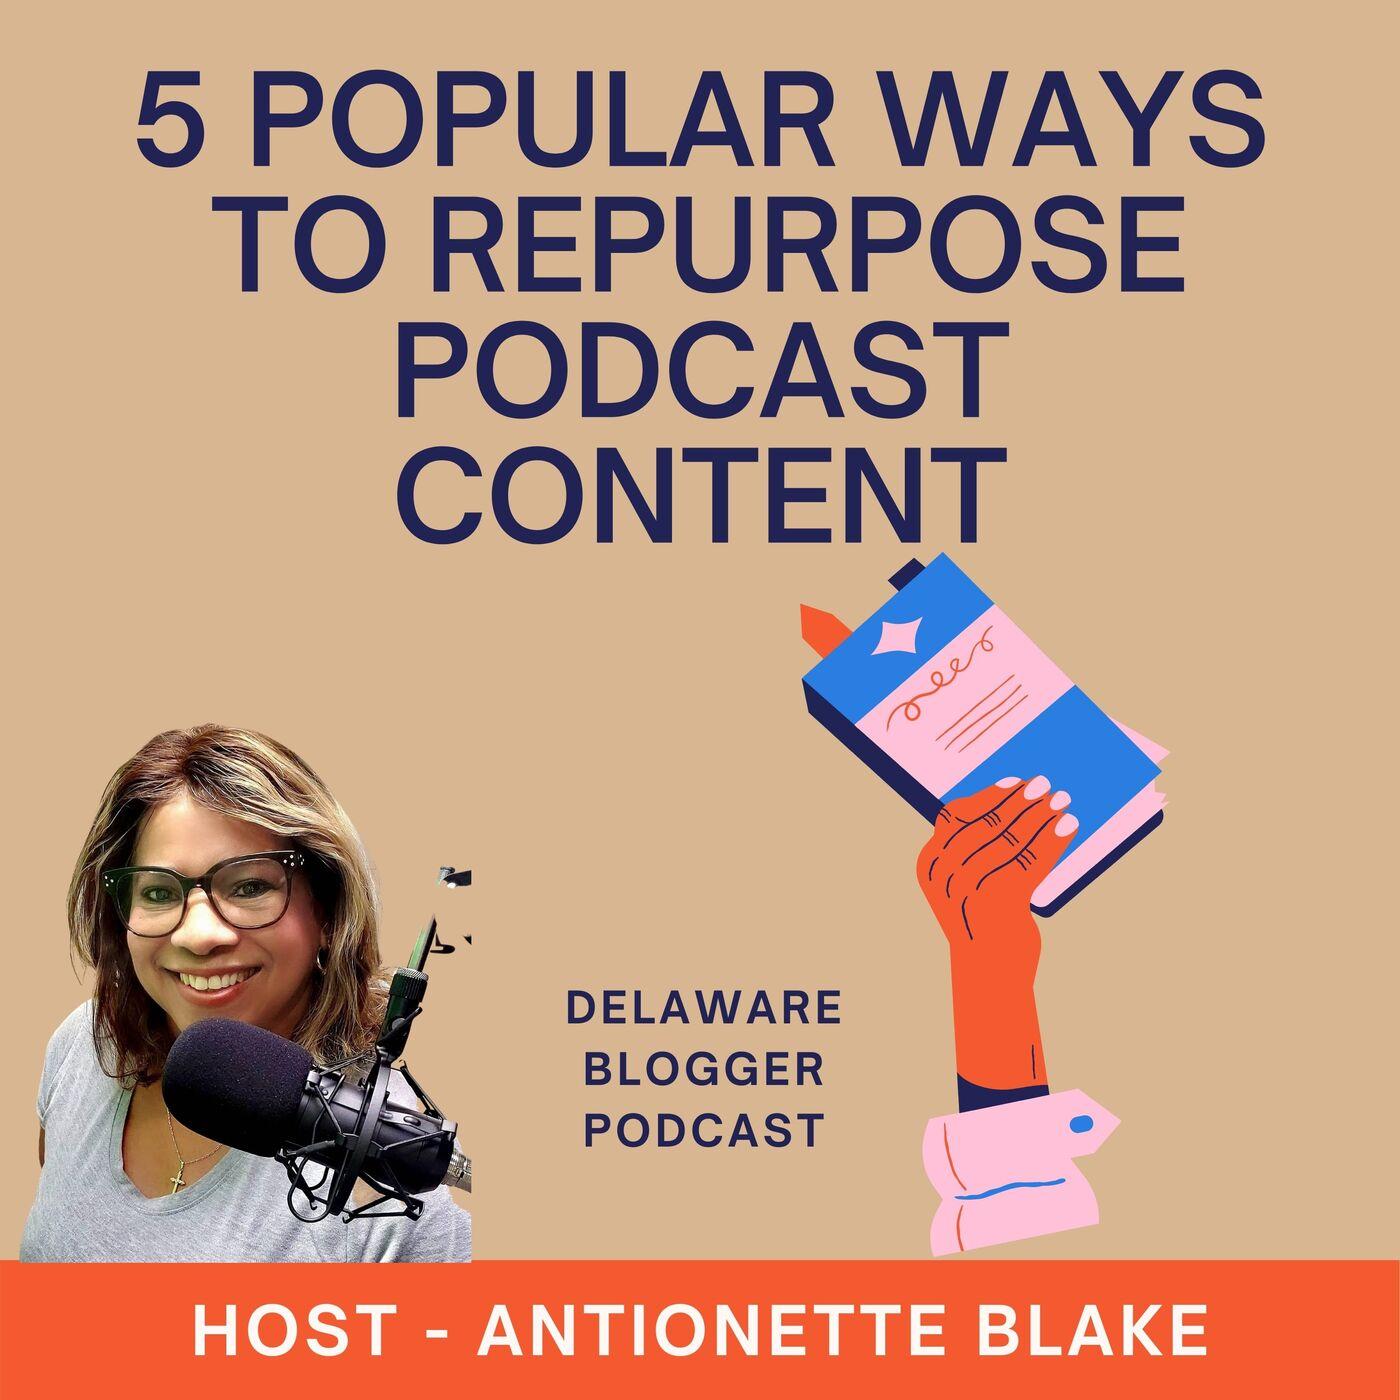 5 Popular Ways to RePurpose Podcast Content